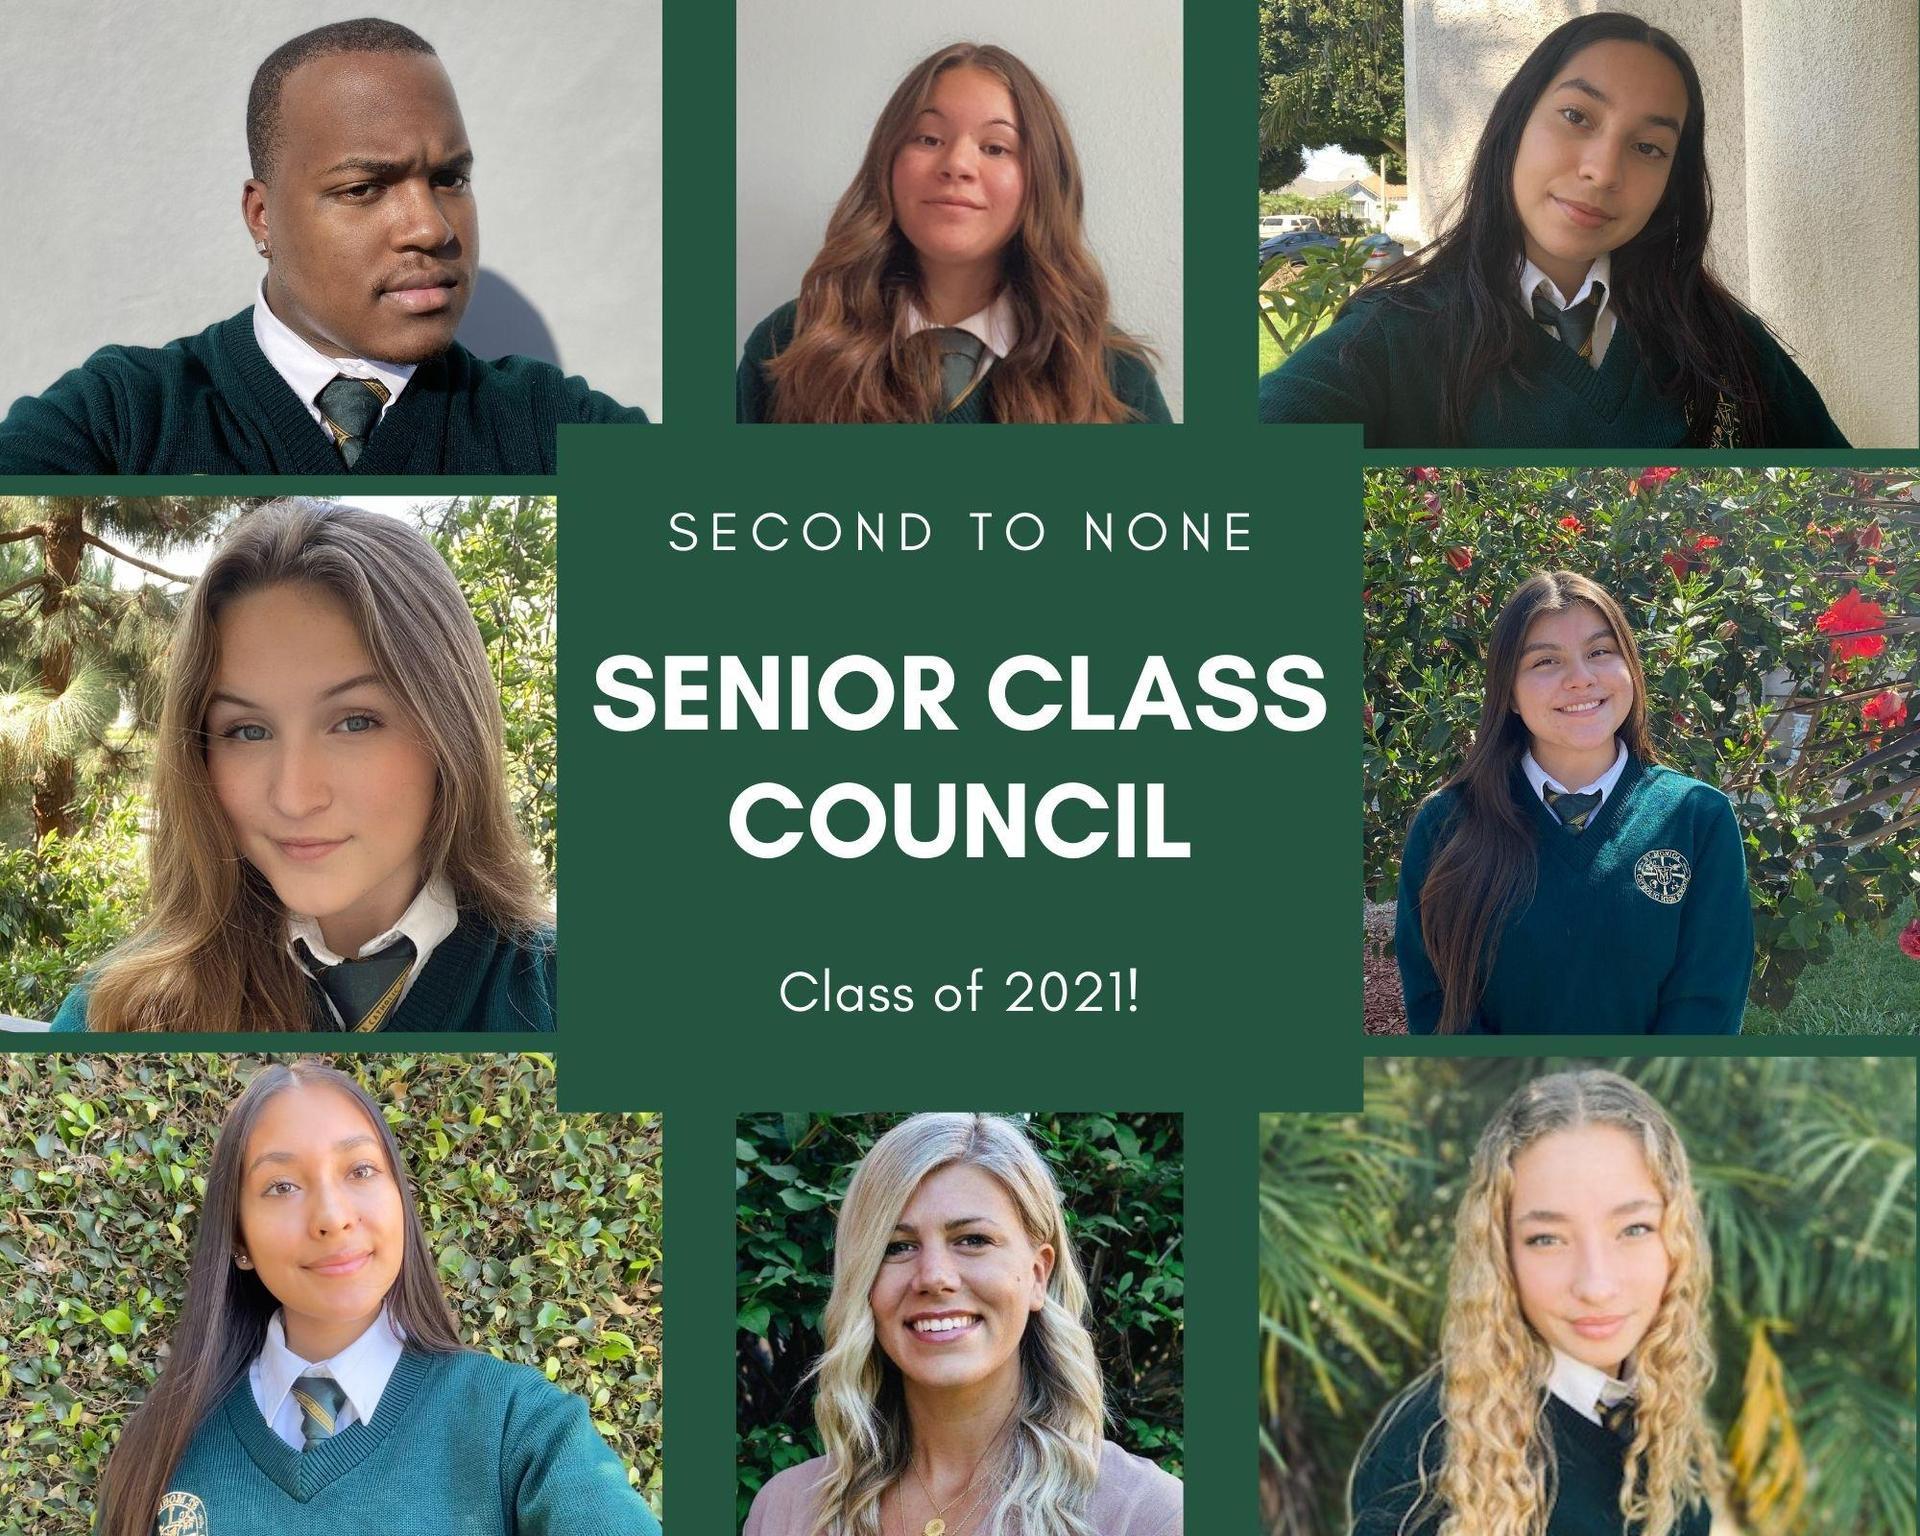 Junior Class ('21) Council